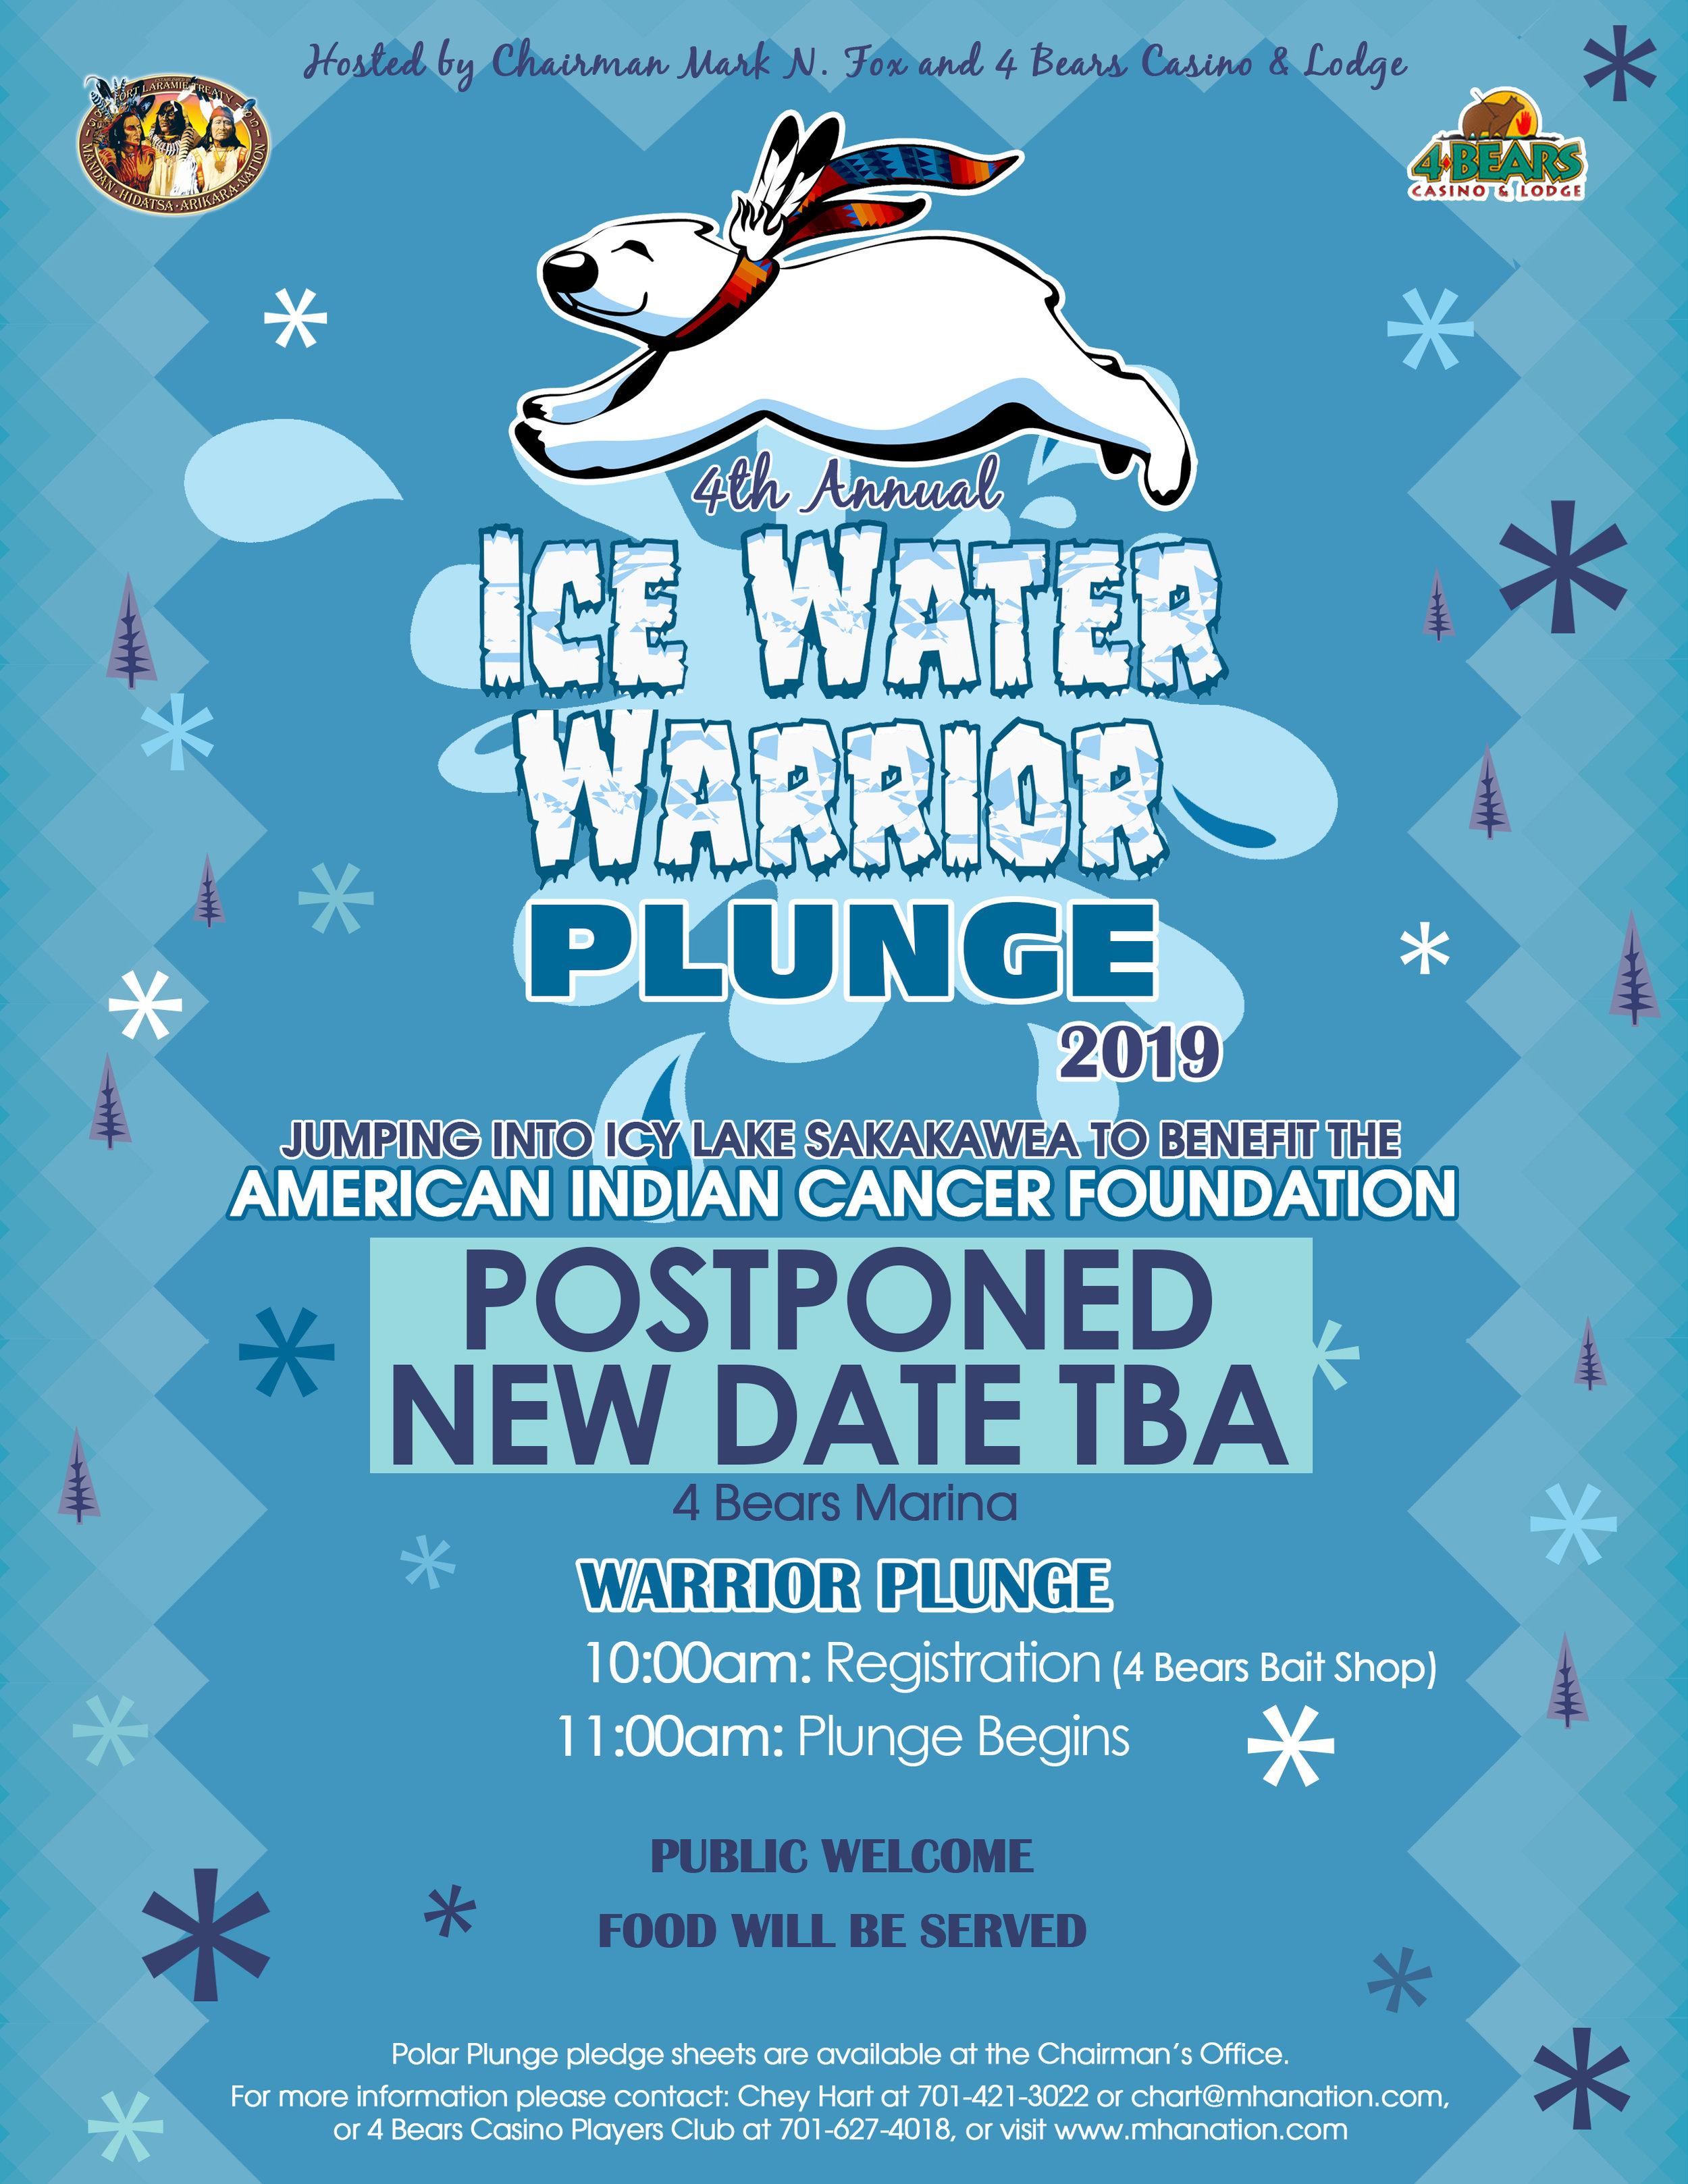 MHANation 4th Annual Ice Water Warrior Plunge Feb 2019_POSTPONED.jpg